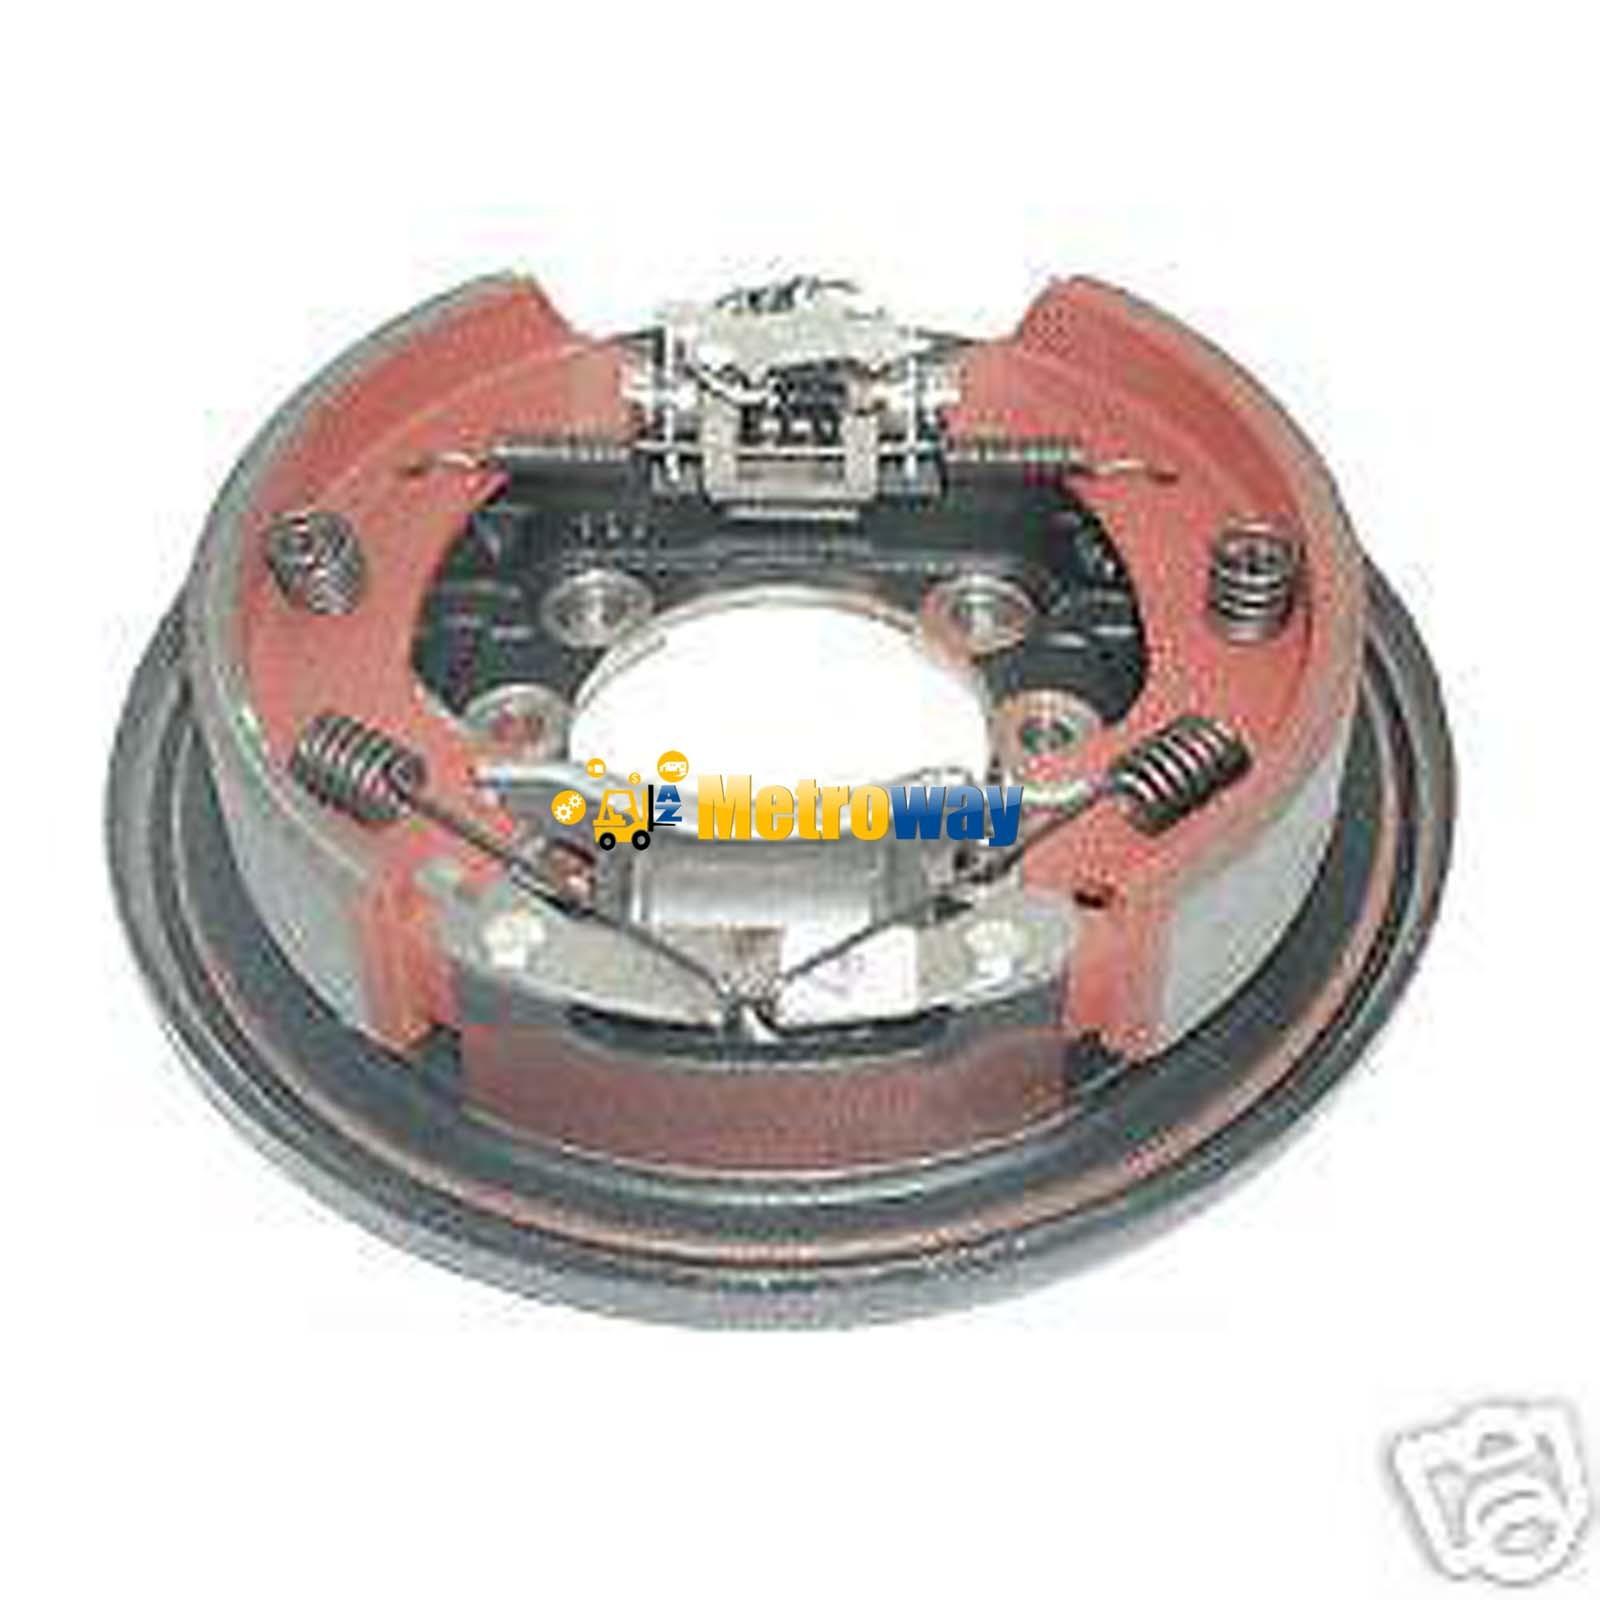 wiring diagram clark c500 clark forklift parts diagram funky clark forklift wiring #9